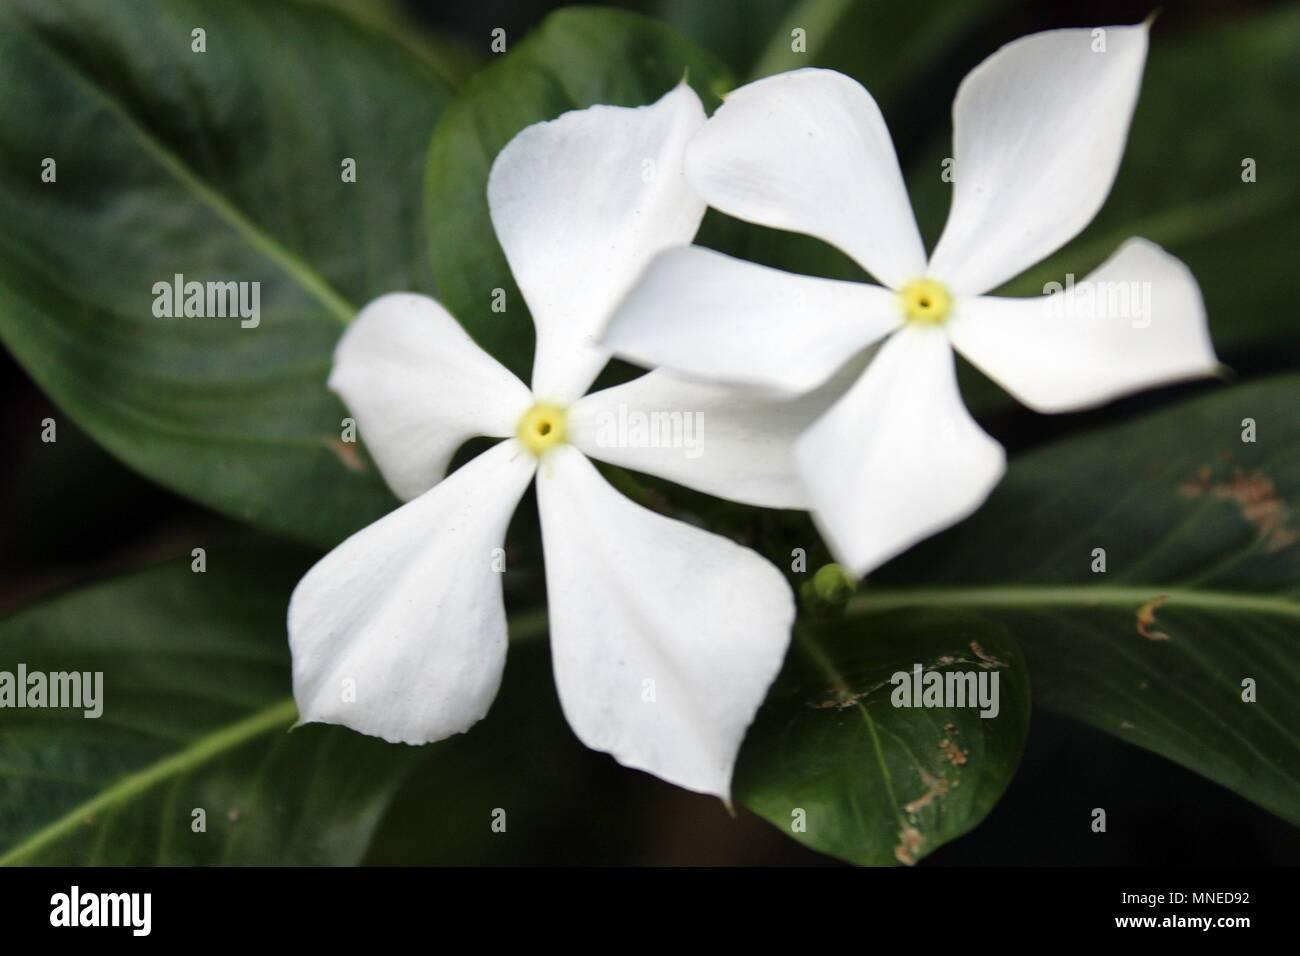 Delicate White Flowers Stock Photo 185329230 Alamy